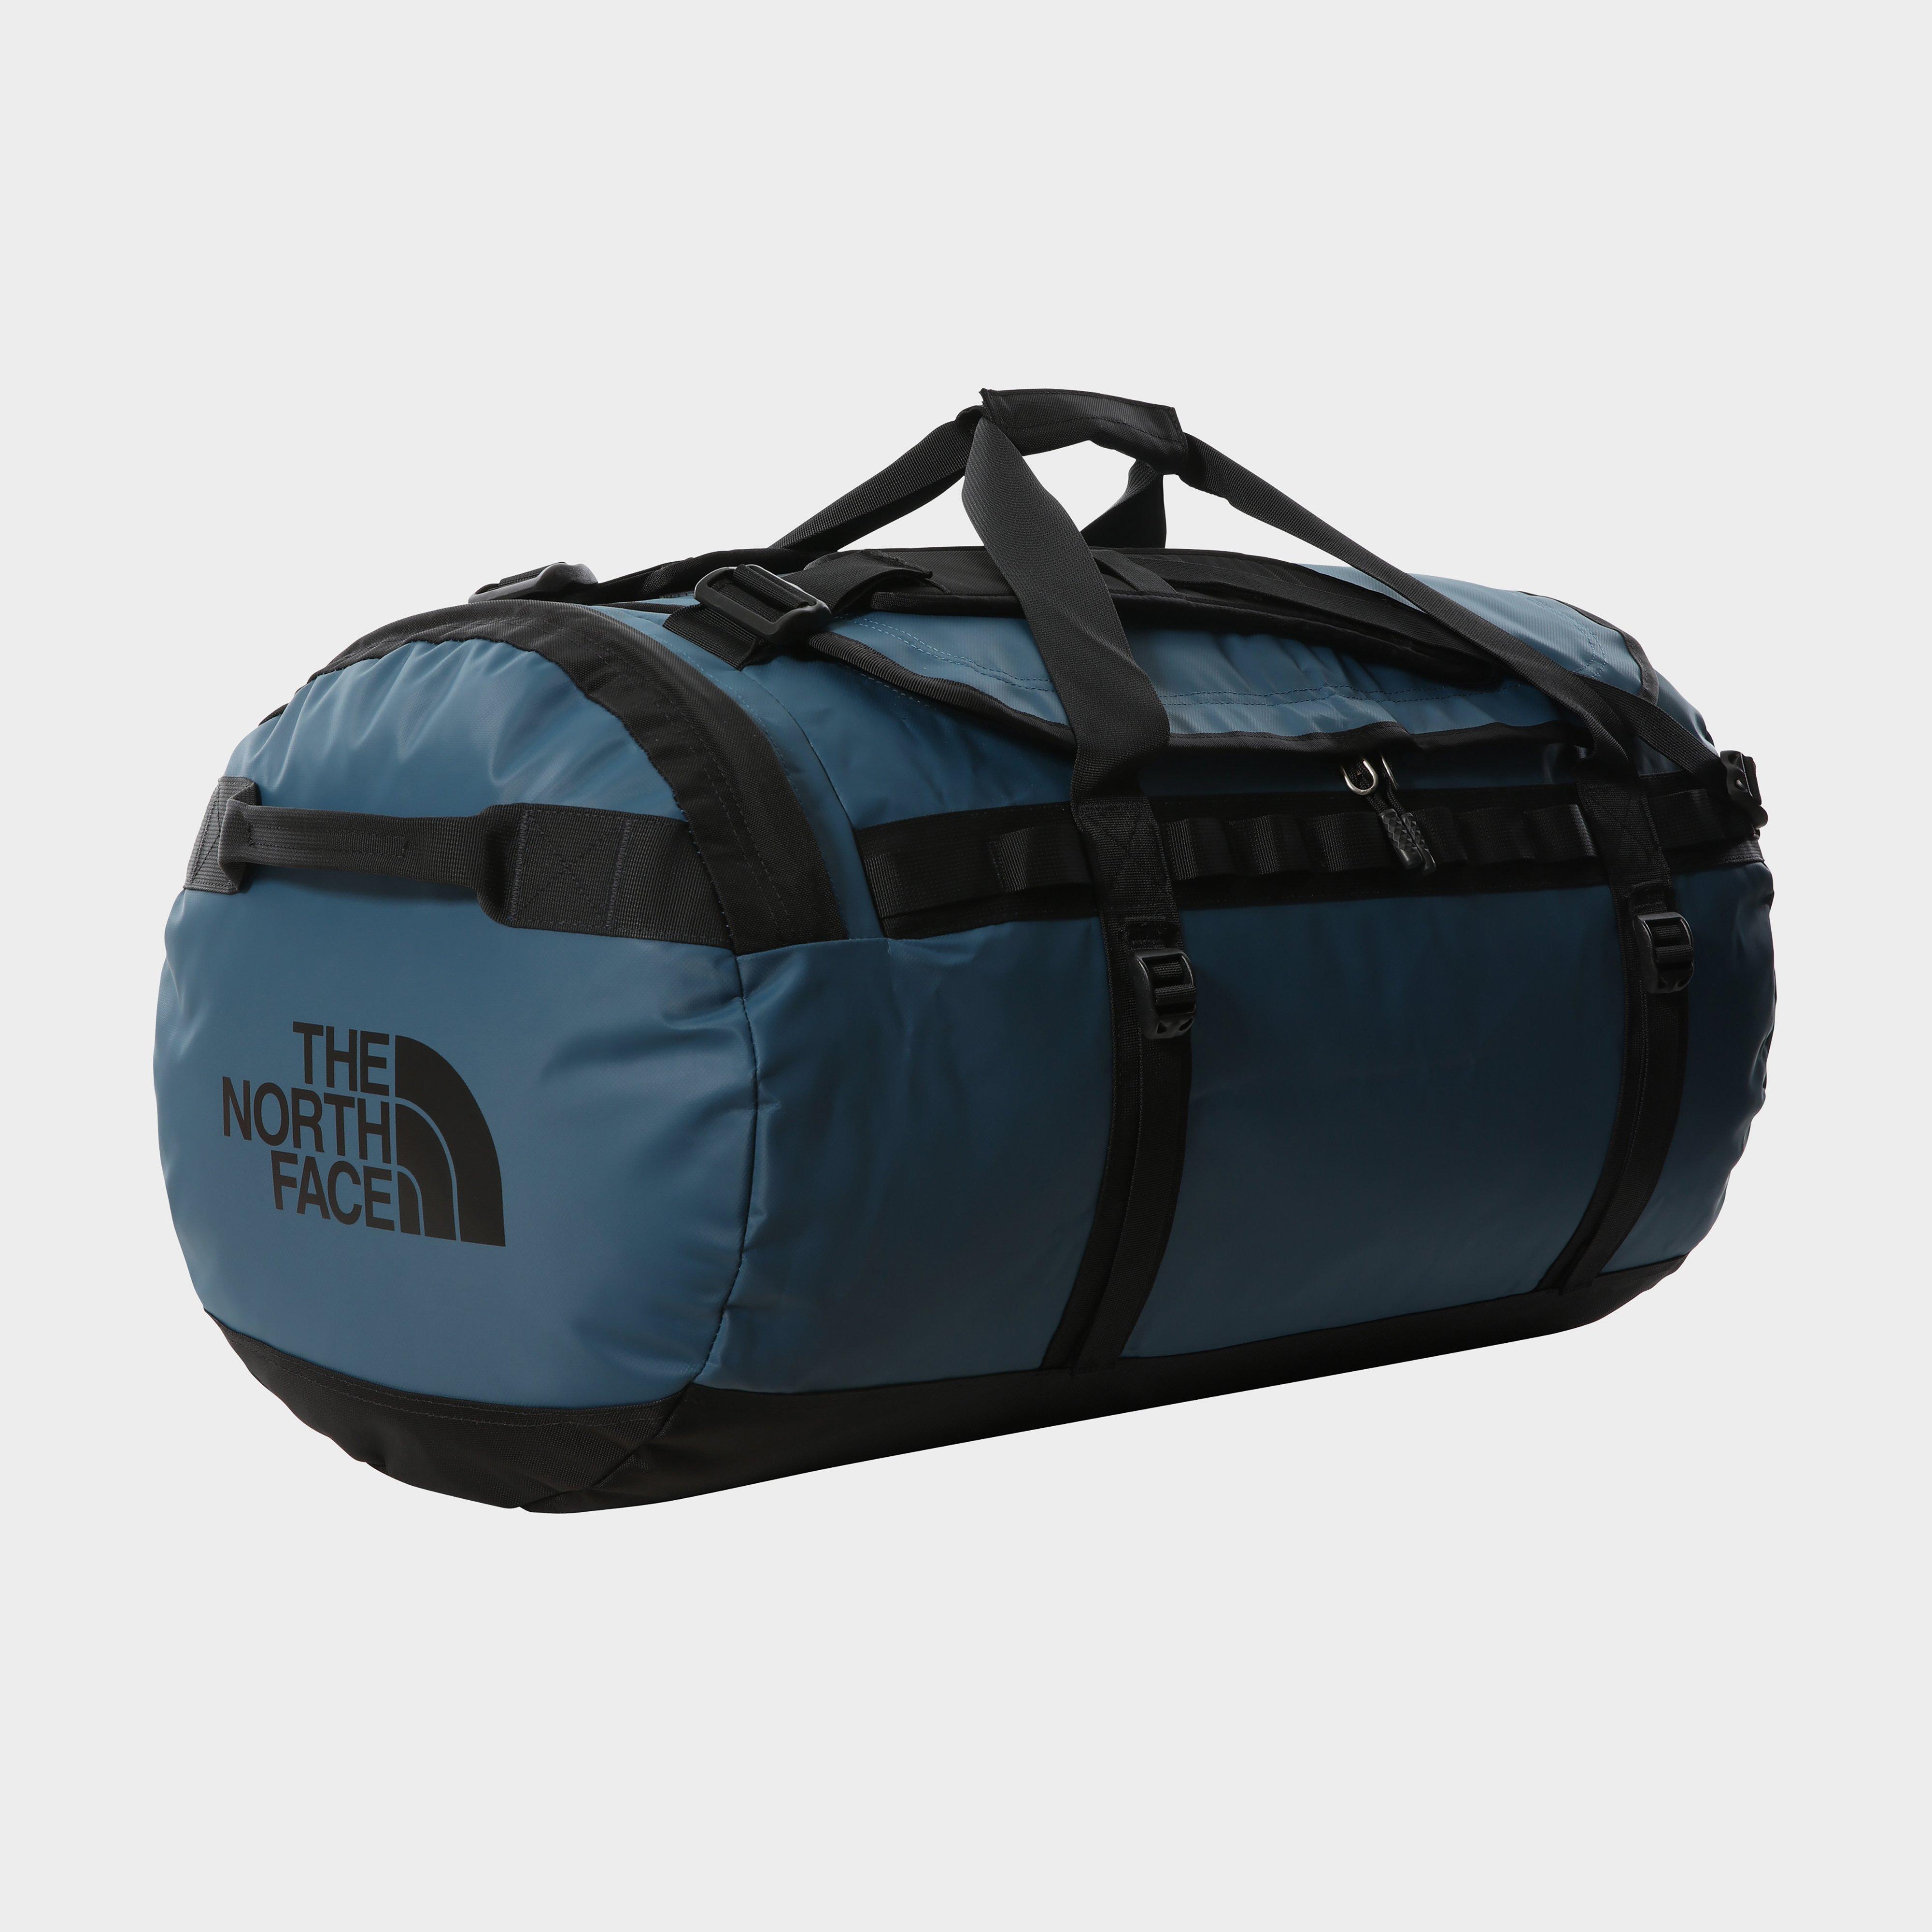 The North Face Basecamp Duffel Bag (Large) - Blue/Dark Blue, Blue/Dark Blue